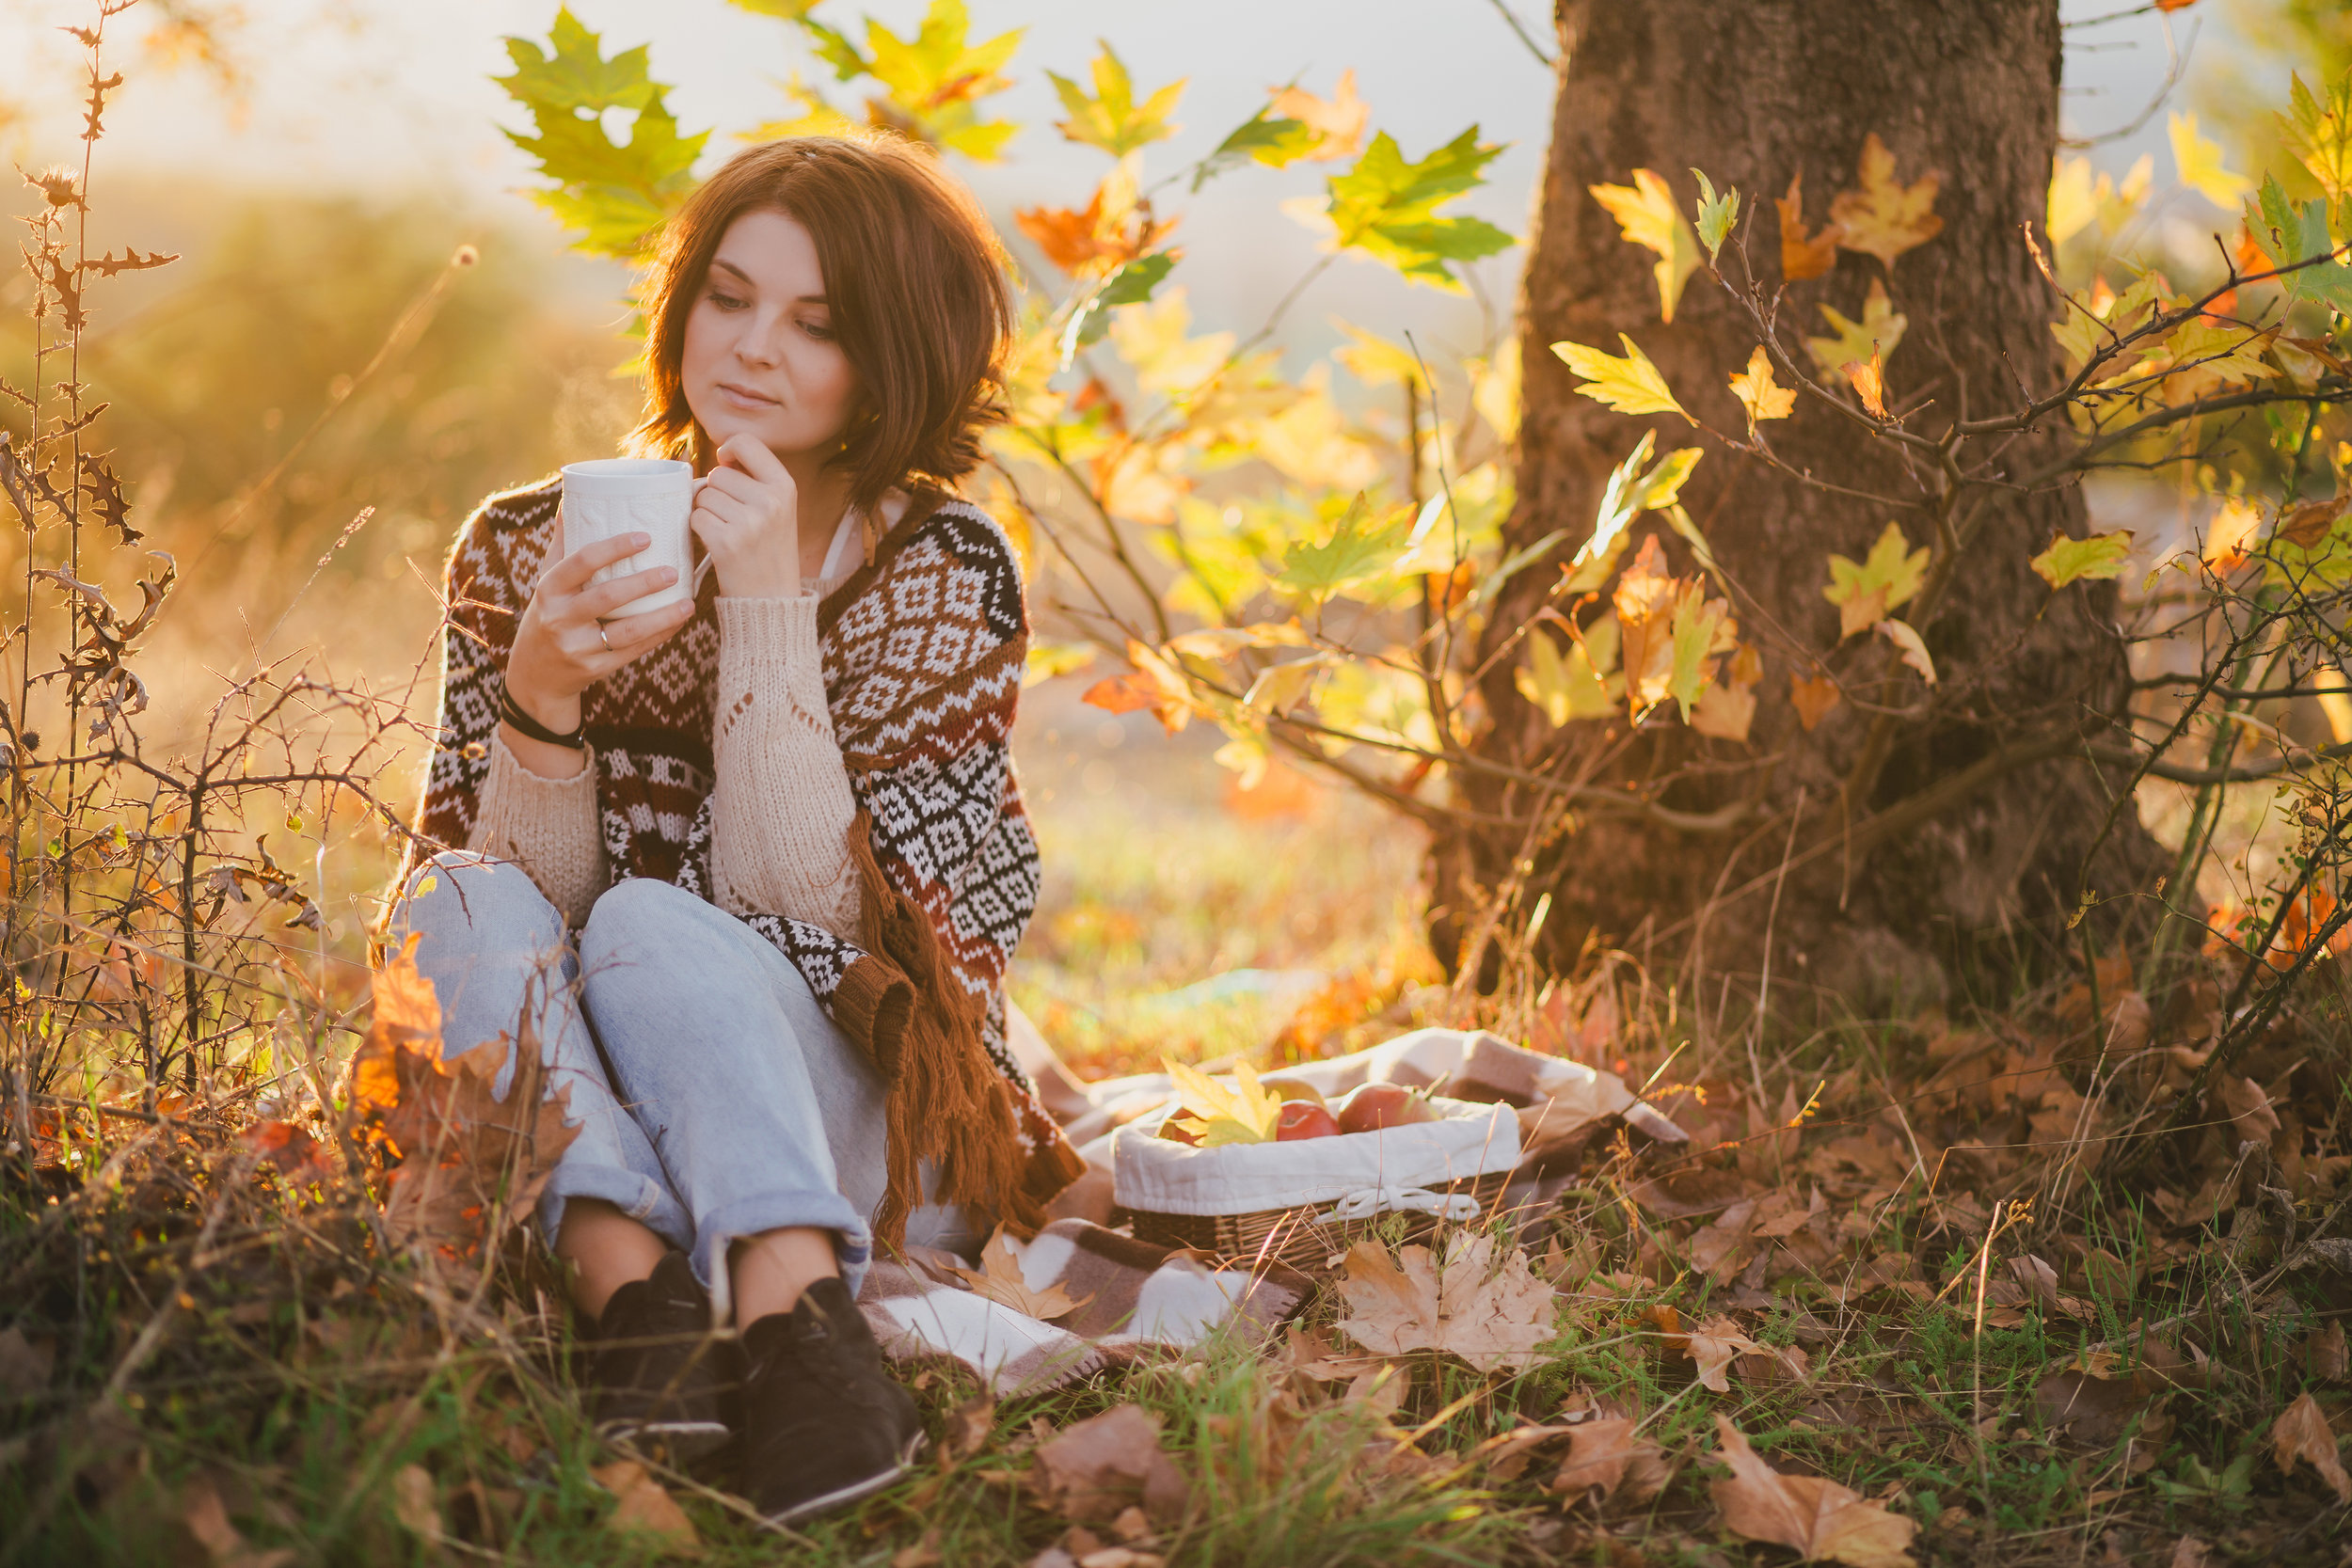 Ayurvedic Healing_Self Care for Seasonal Colds and Flus.jpg